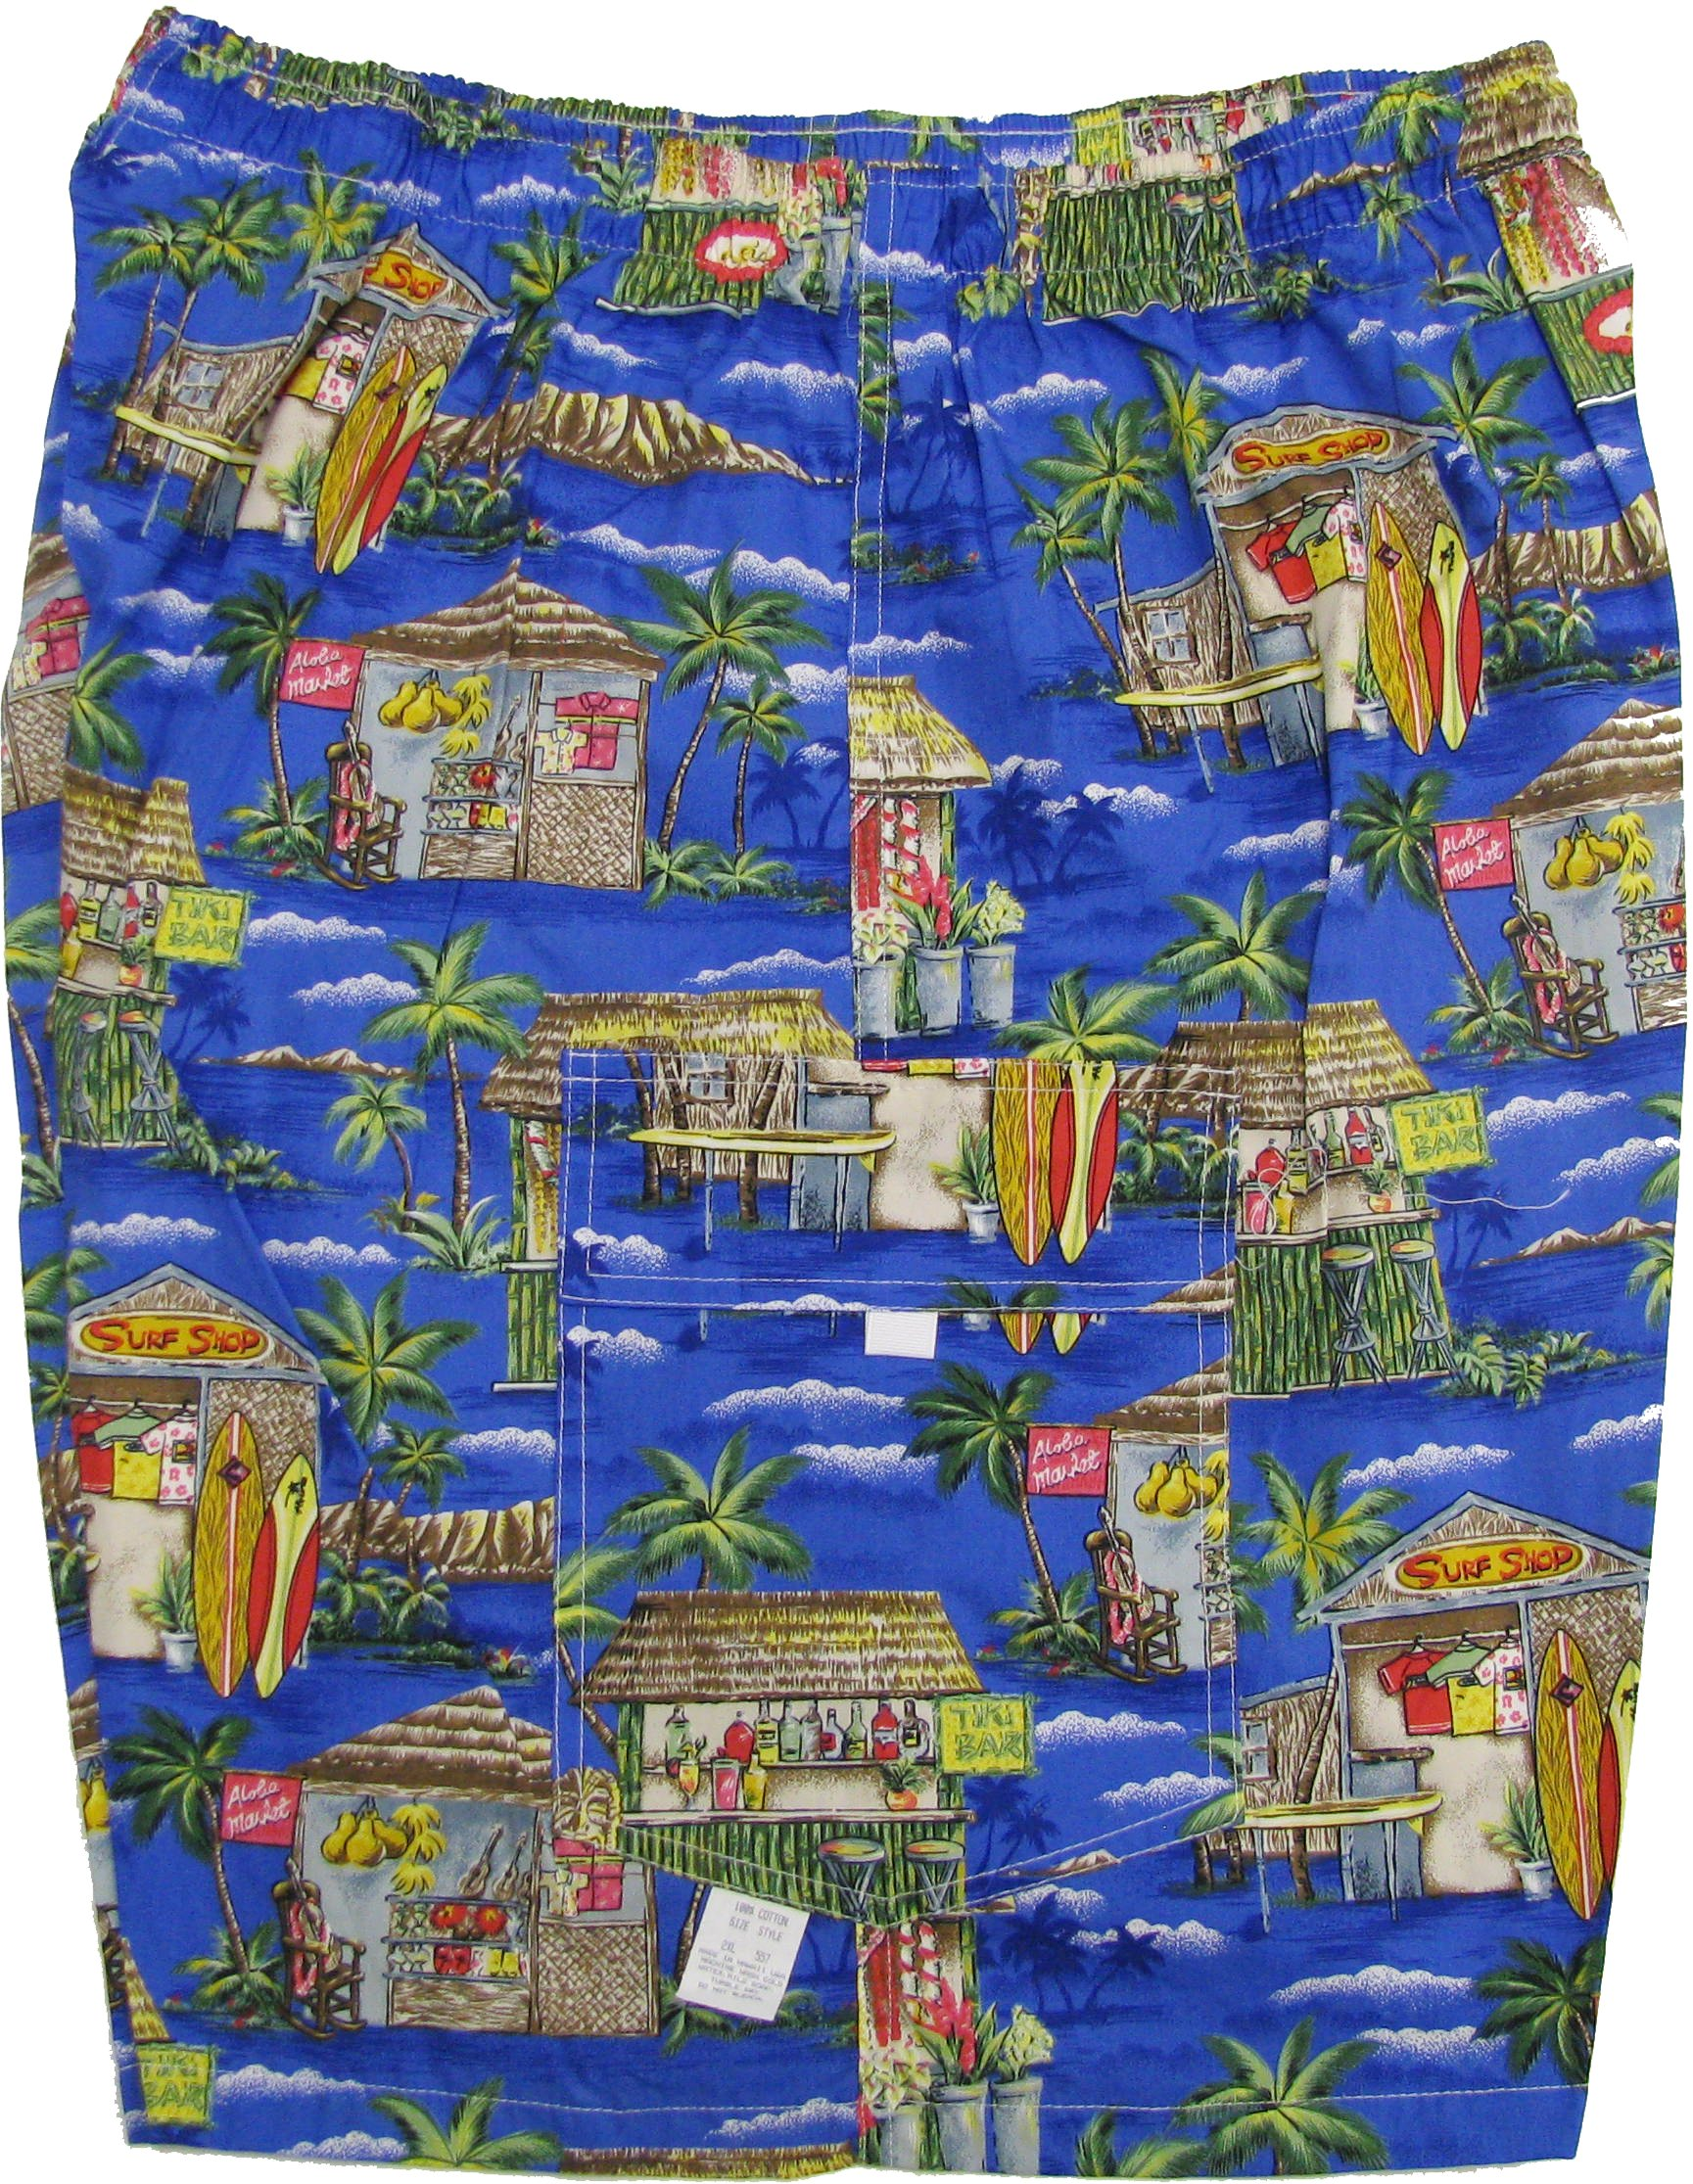 Men's Cargo Shorts - Tiki Bar Surf Shop Elastic Waistband Inside Drawcord Flap Pocket Cotton Shorts in Royal Blue - M